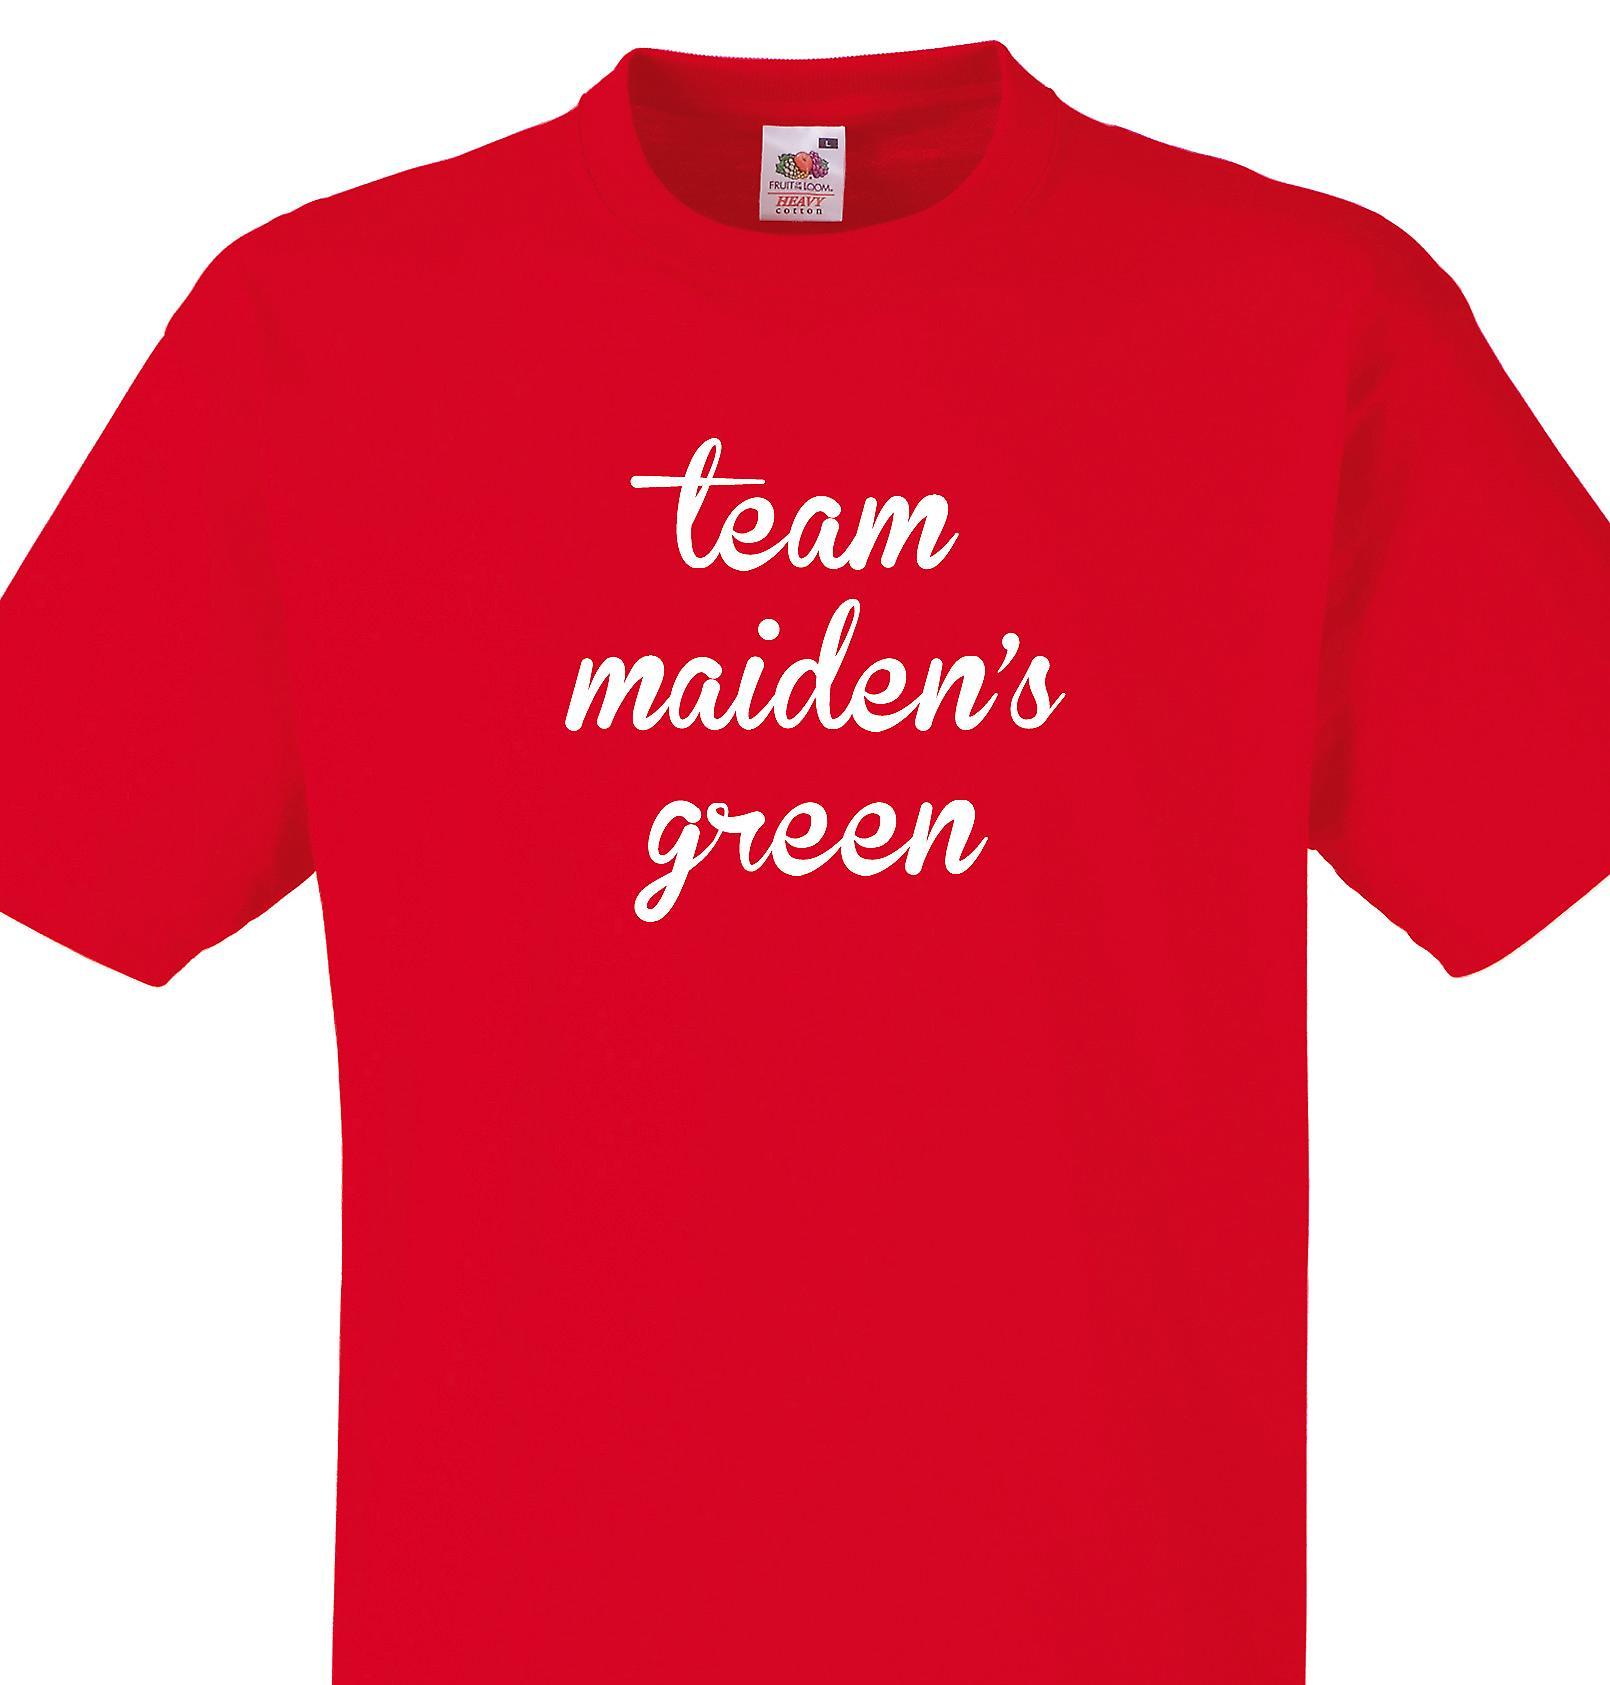 Team Maiden's green Red T shirt